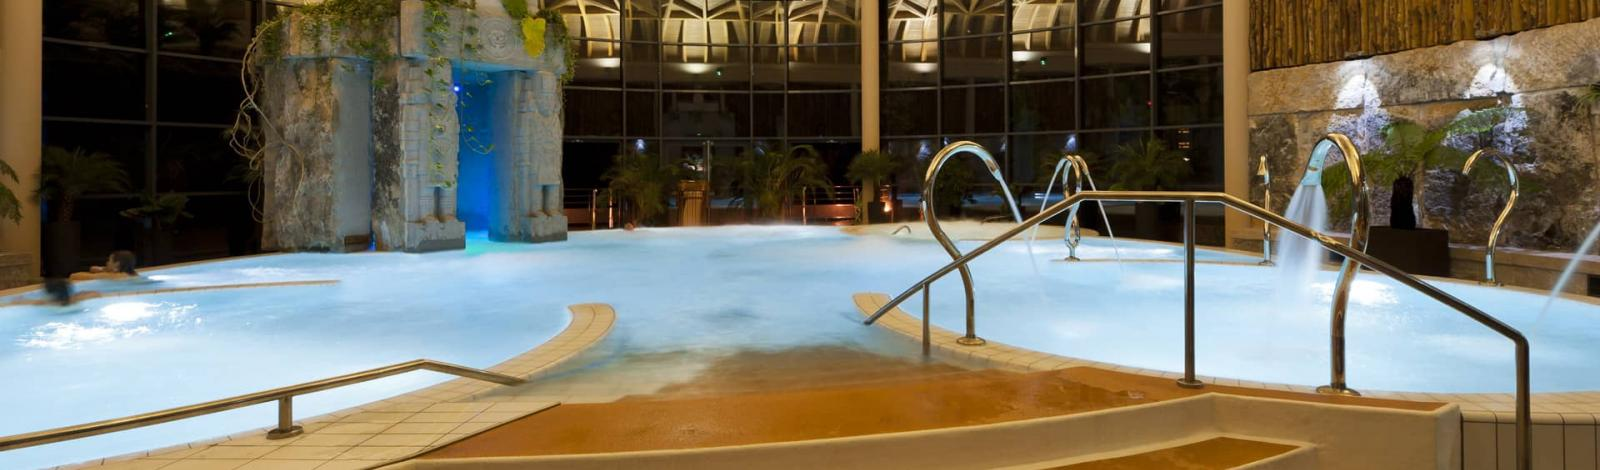 Jardin des bains